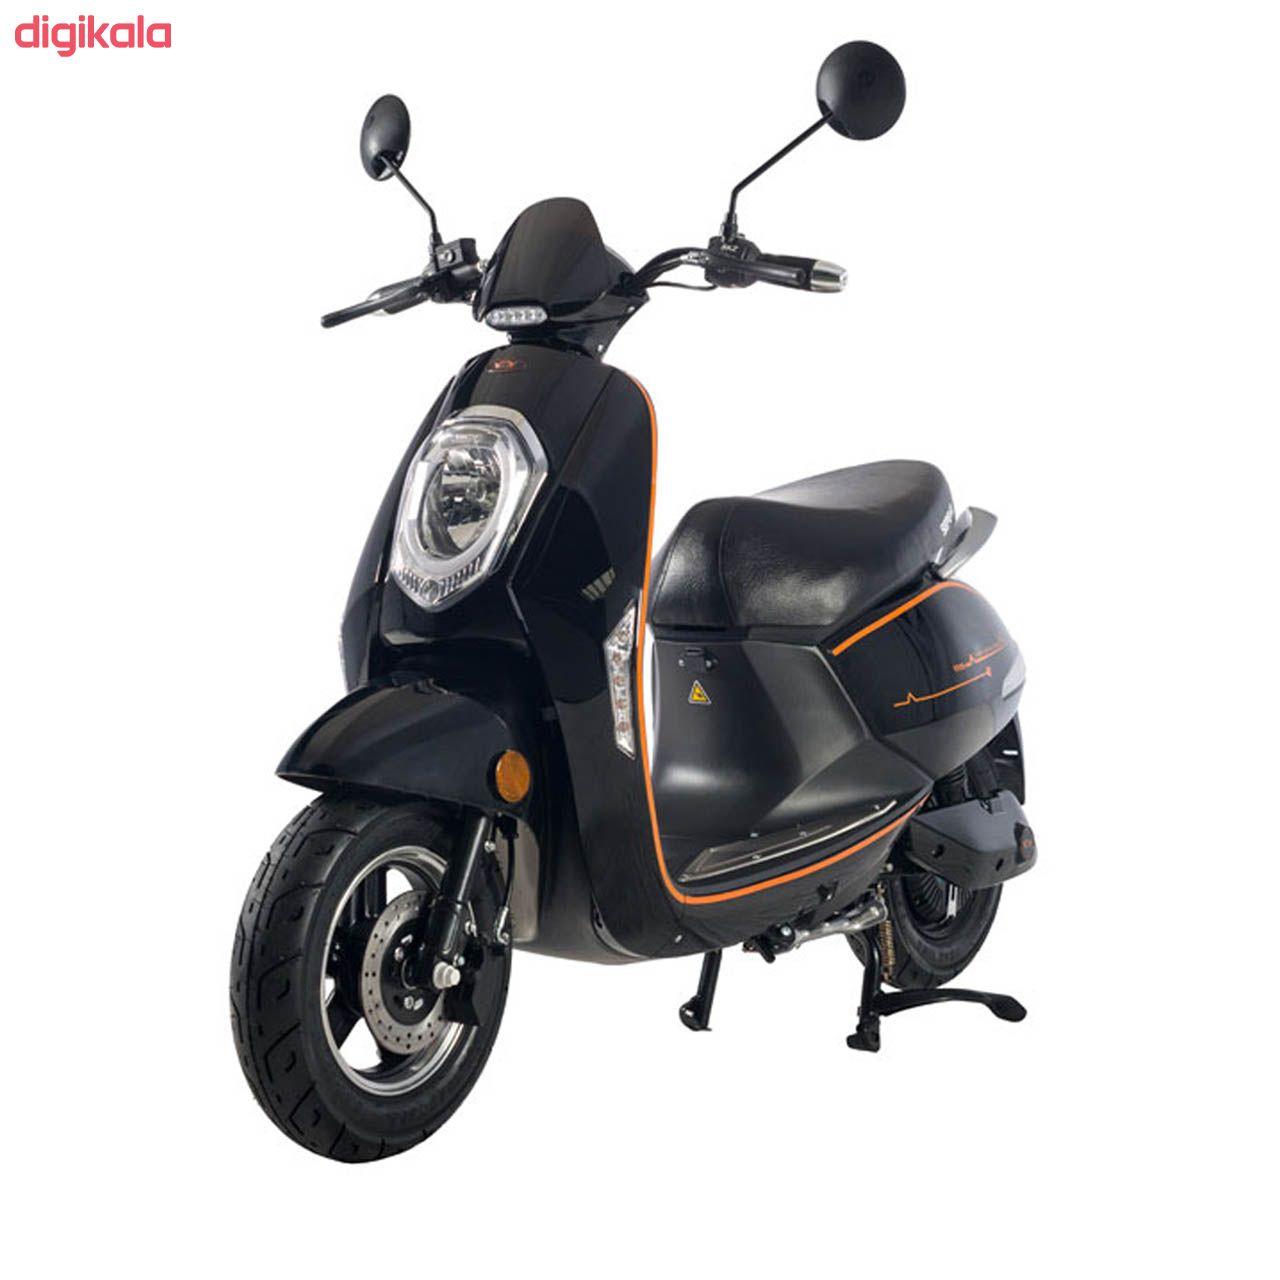 موتورسیکلت سپهر مدل 1600SKZ وات سال 1399 main 1 2